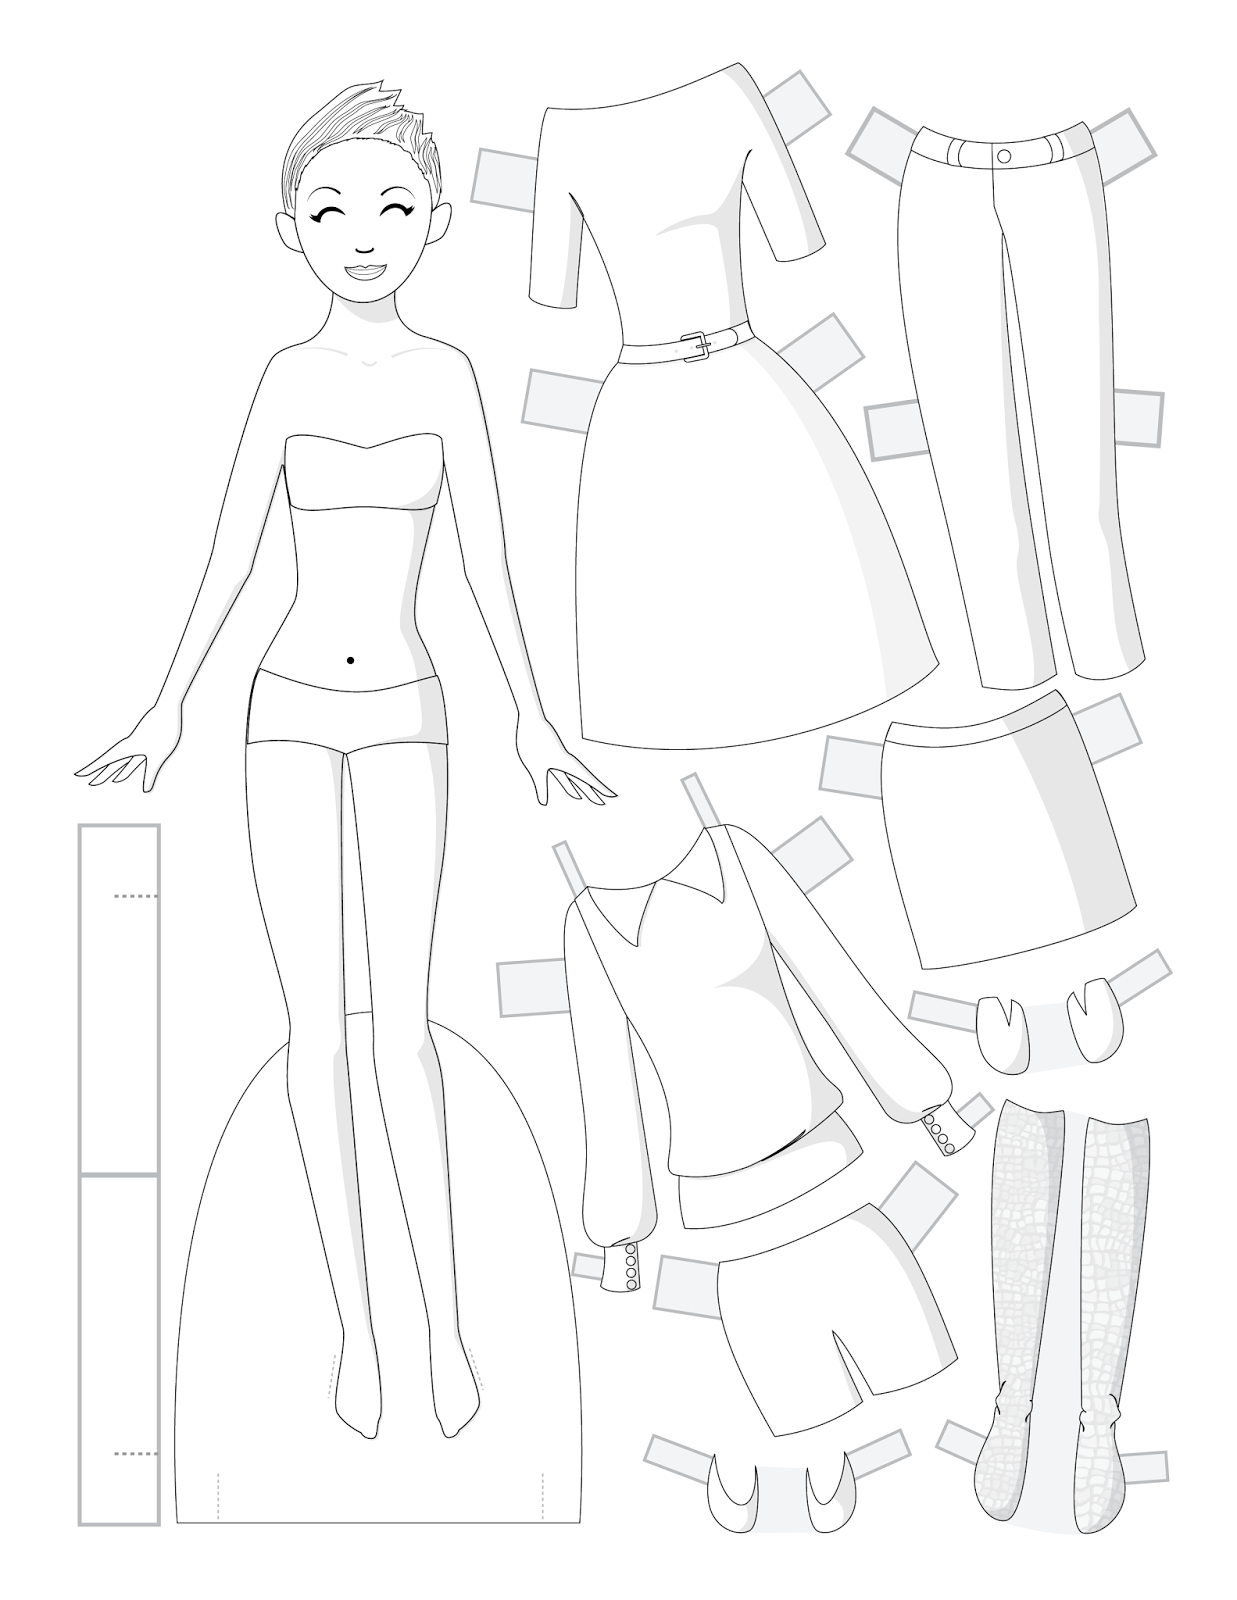 Paper Doll School: Fashion Friday: Black & White: Set 2